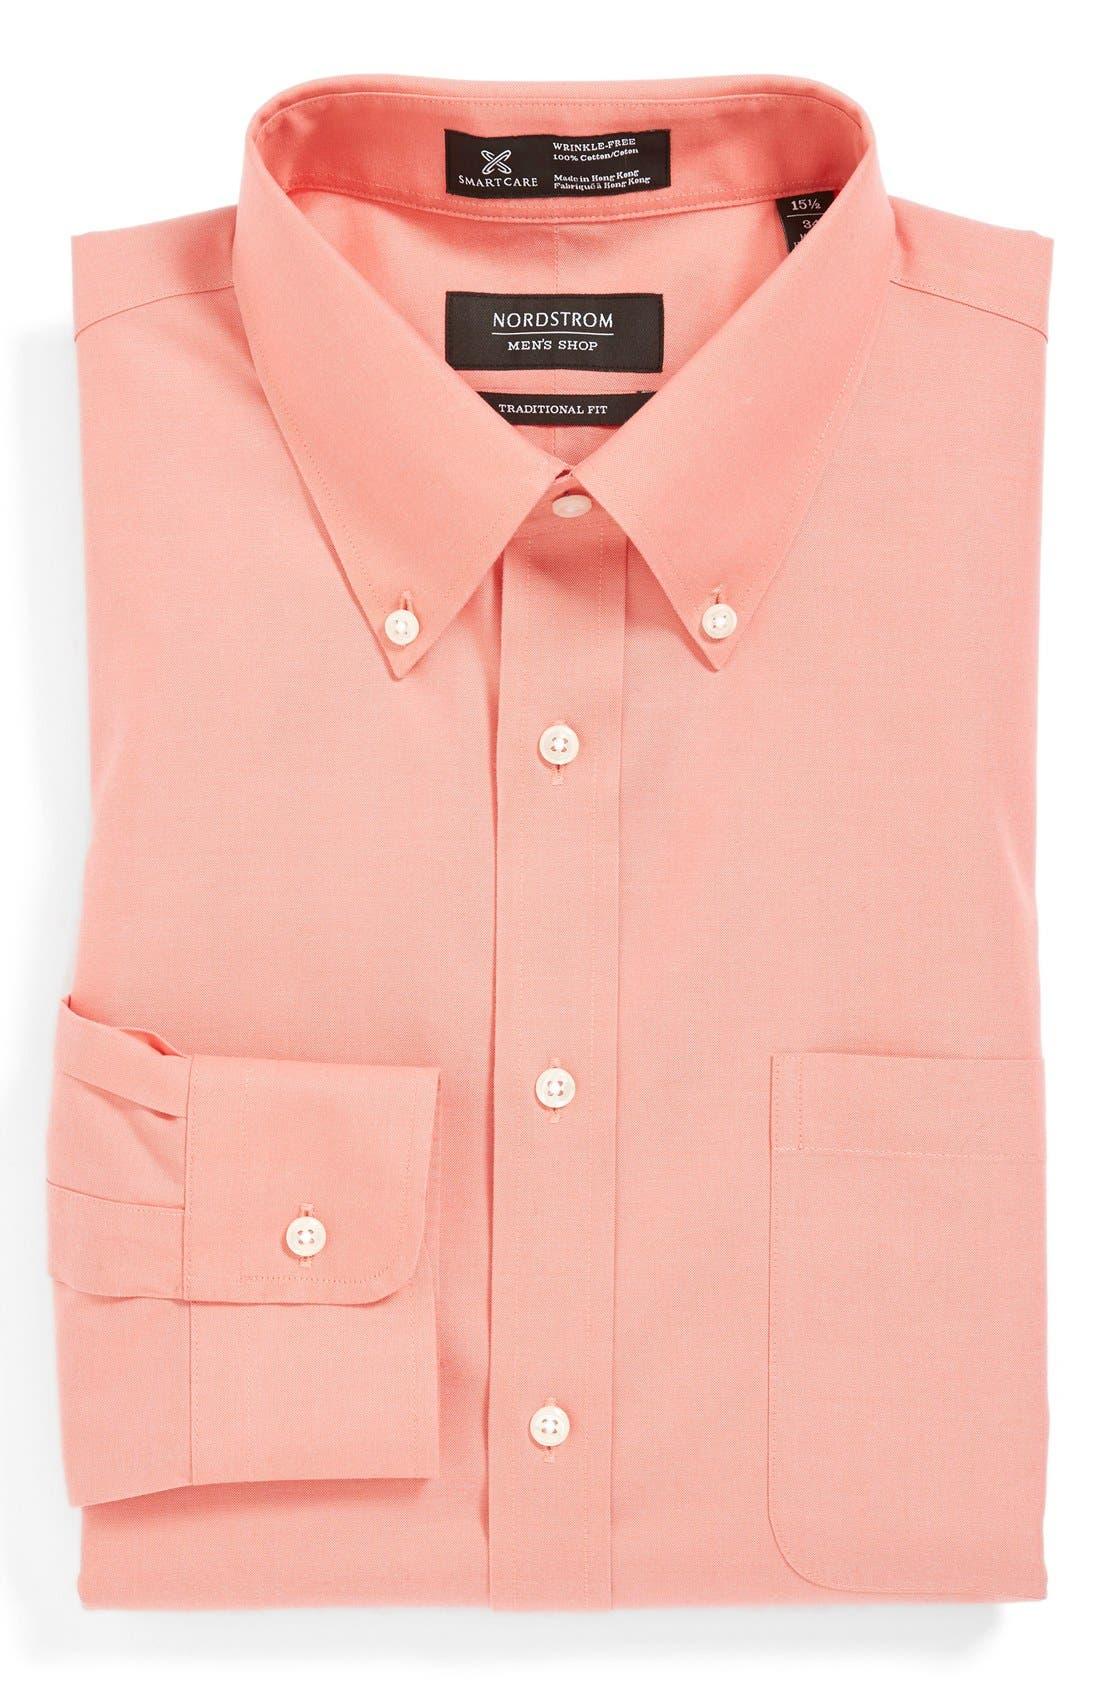 Main Image - Nordstrom Men's Shop Smartcare™ Traditional Fit Pinpoint Dress Shirt